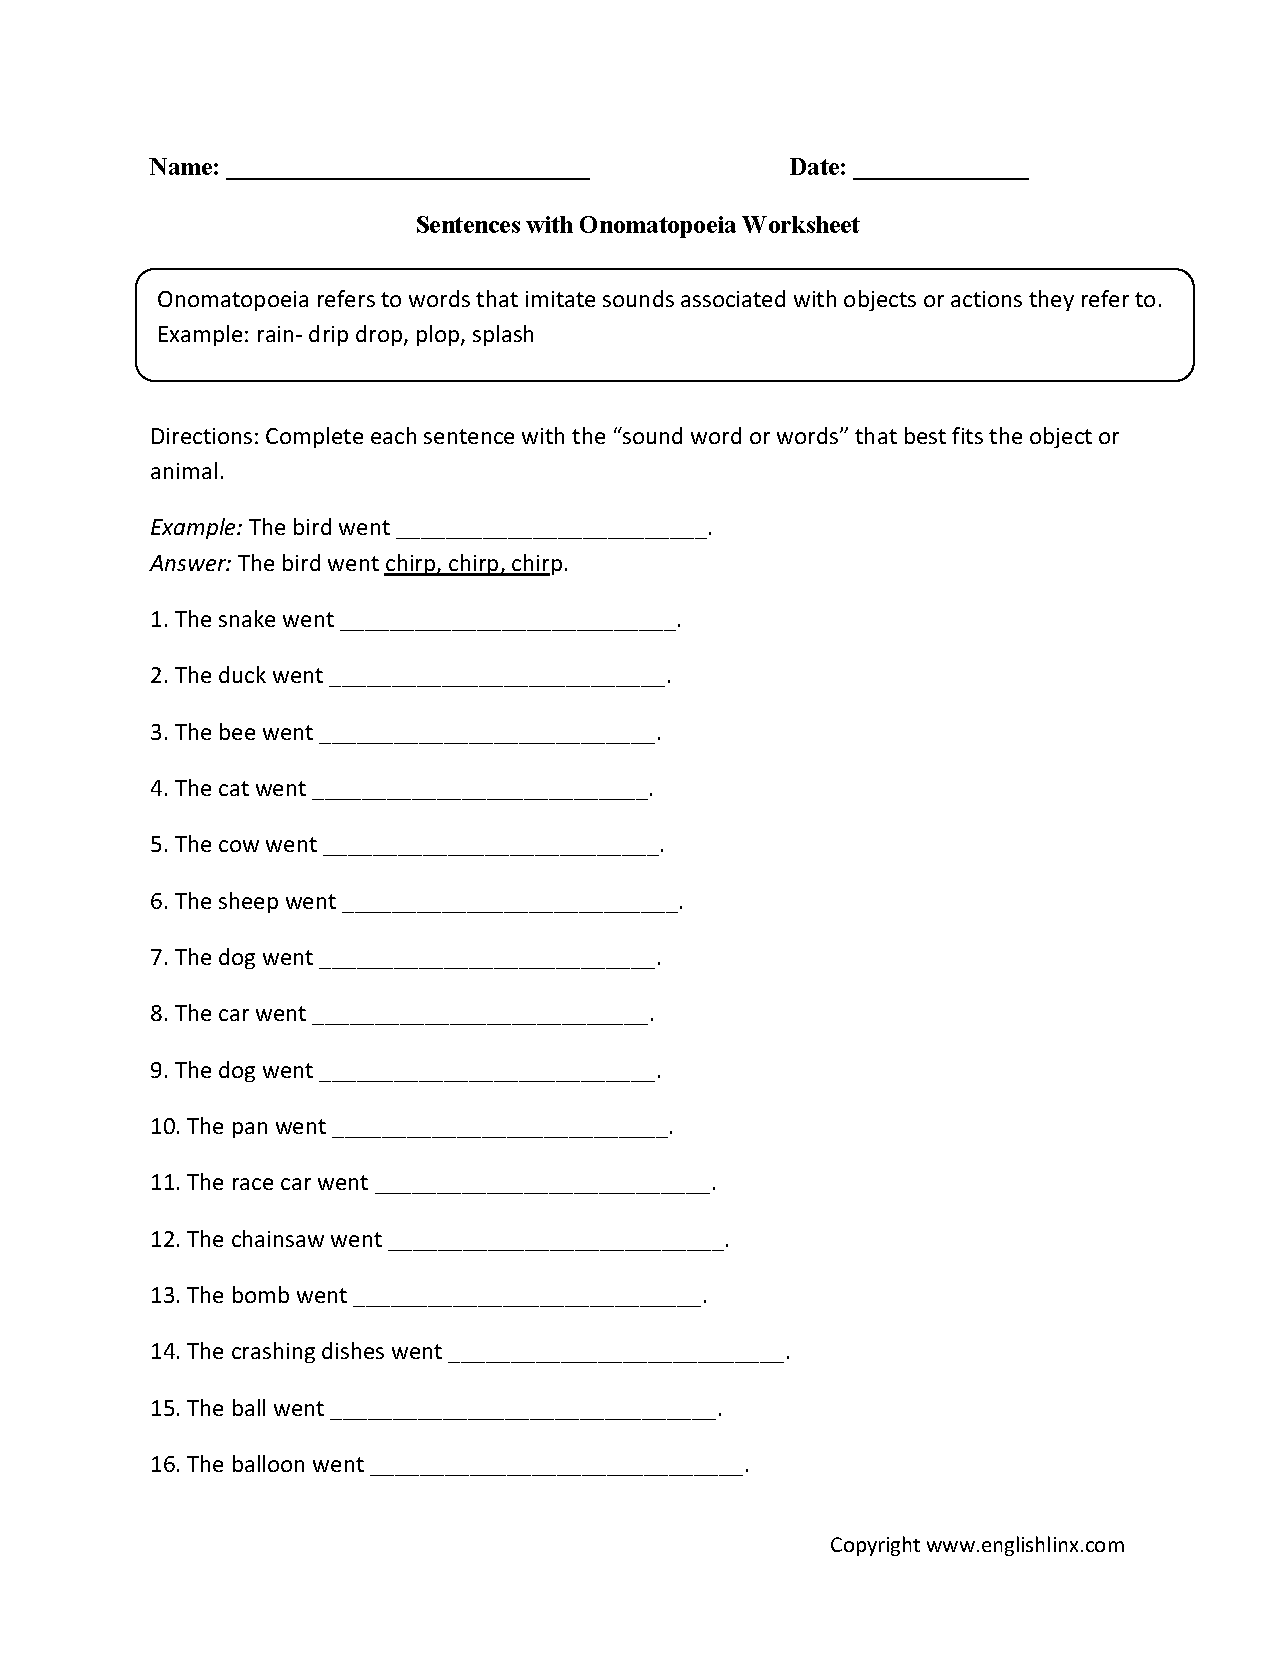 hight resolution of Onomatopoeia Worksheets   Sentences with Onomatopoeia Worksheet    Onomatopoeia